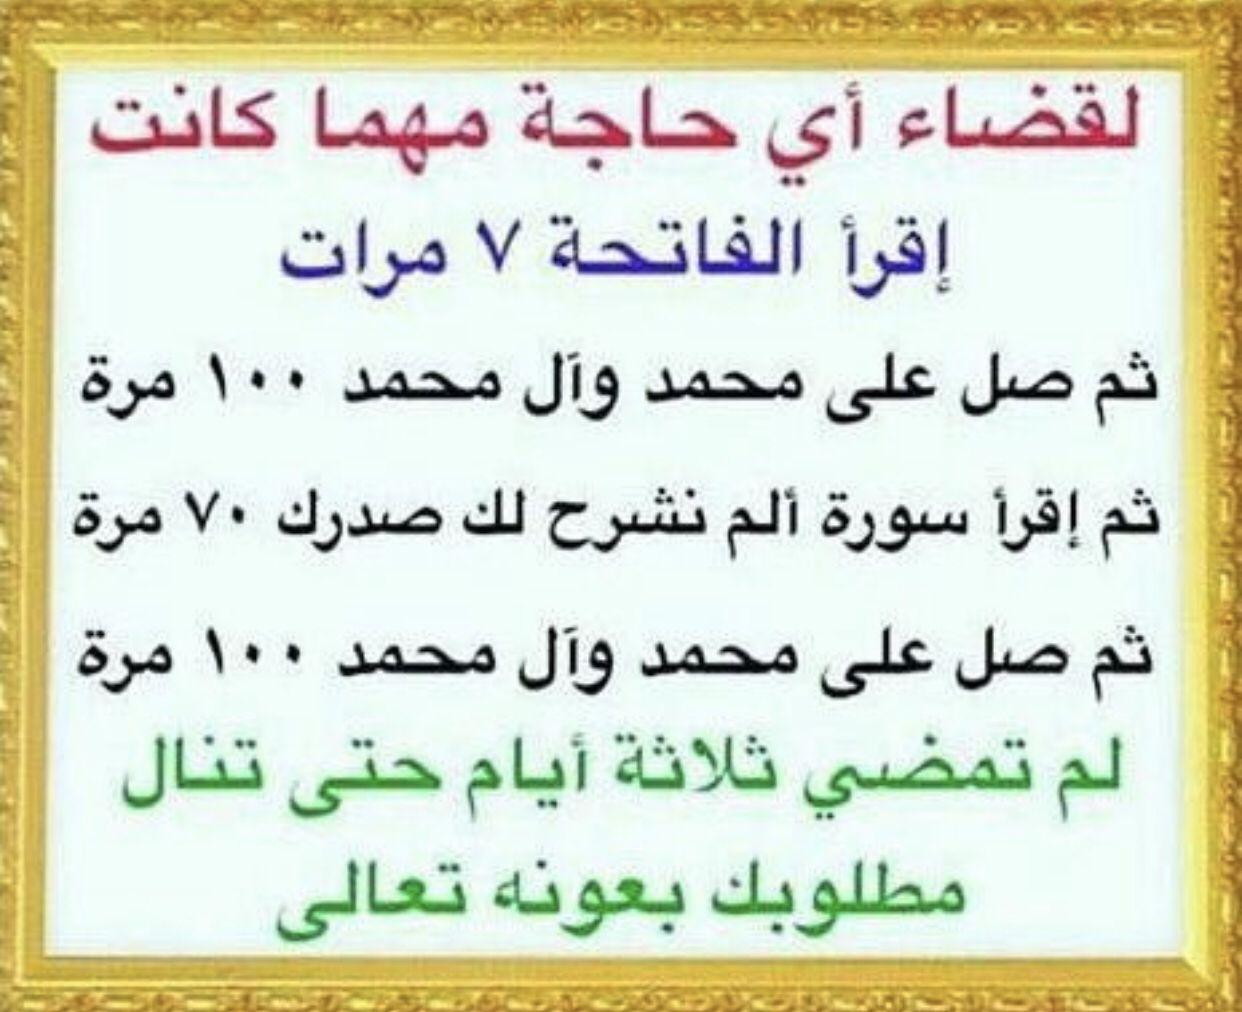 Pin By Samah Elgohary On About Life Quran Arabic Islam Facts Duaa Islam